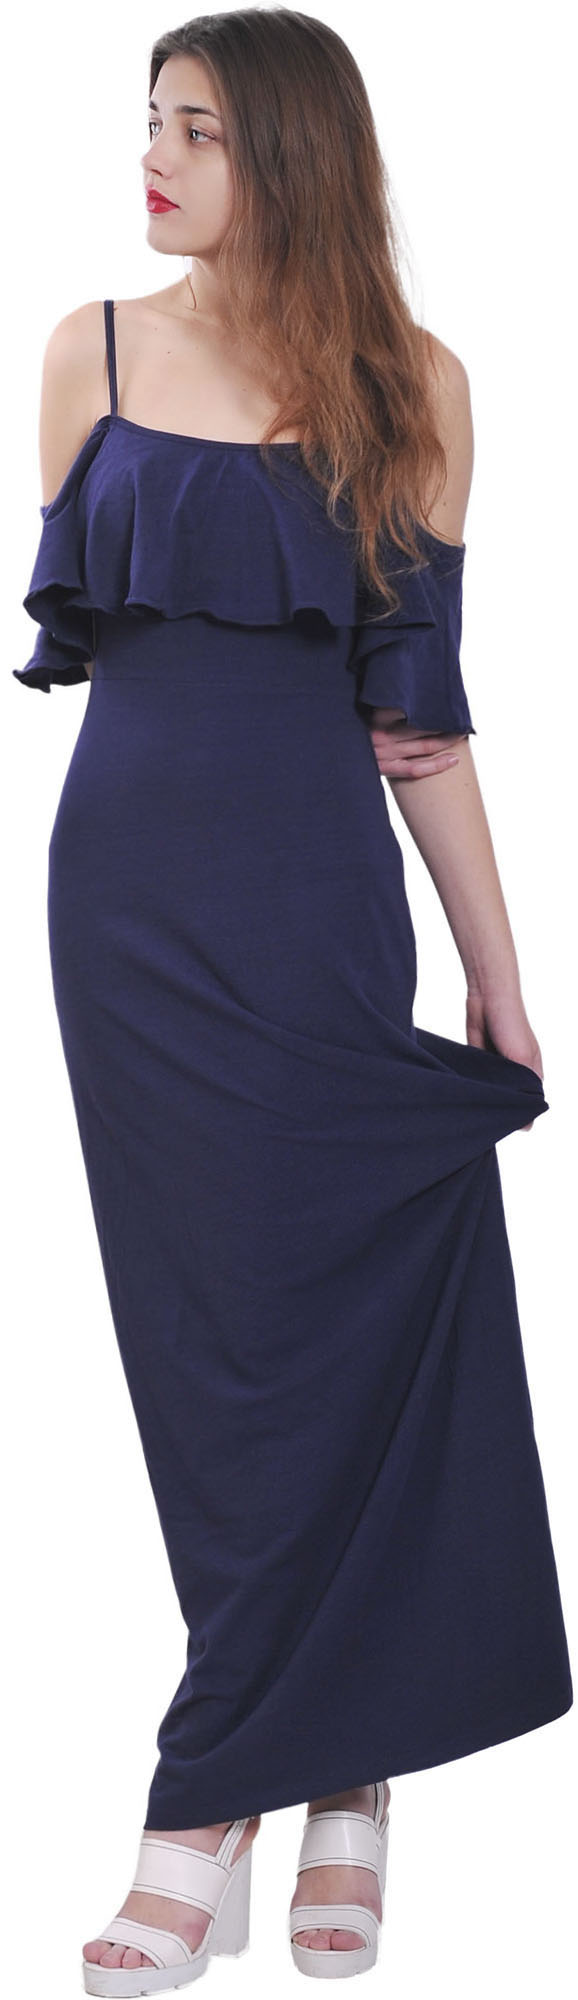 WOMENS OFF COLD SHOULDER BOHO MAXI LONG DRESSES SUMMER BEACH PLUS ... cdd20a04b1